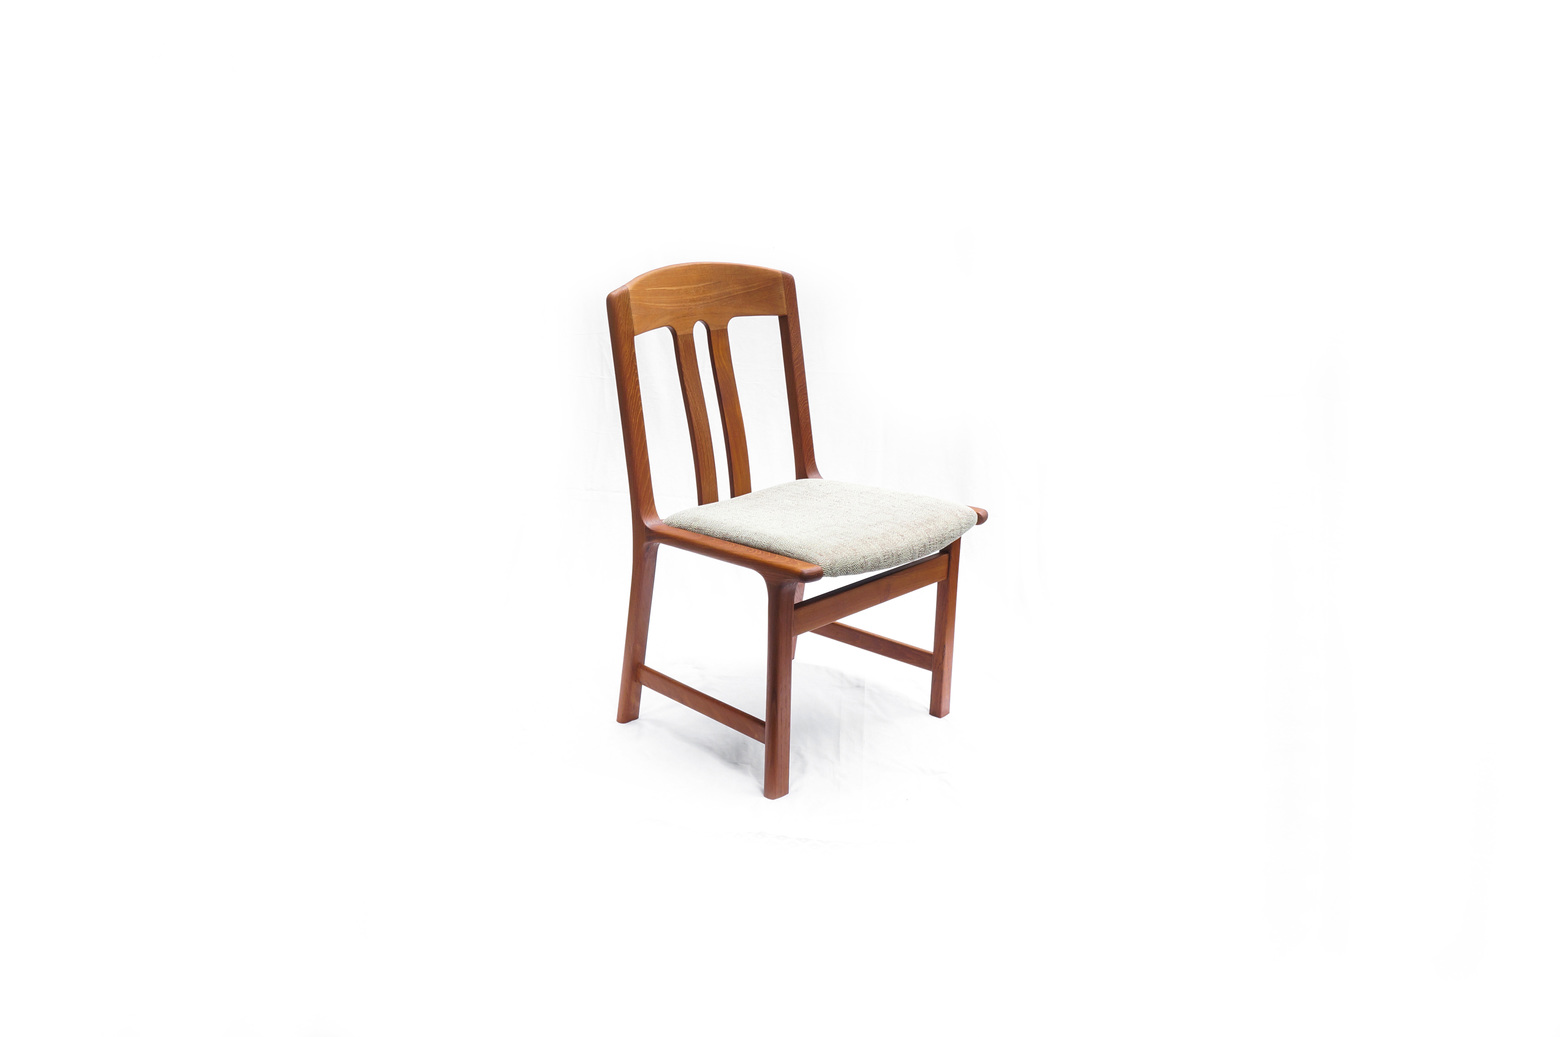 Danish Vintage L.Olsen&Son Dining Chair/デンマークヴィンテージ L.オルセン&サン ダイニング チェア 北欧家具 2